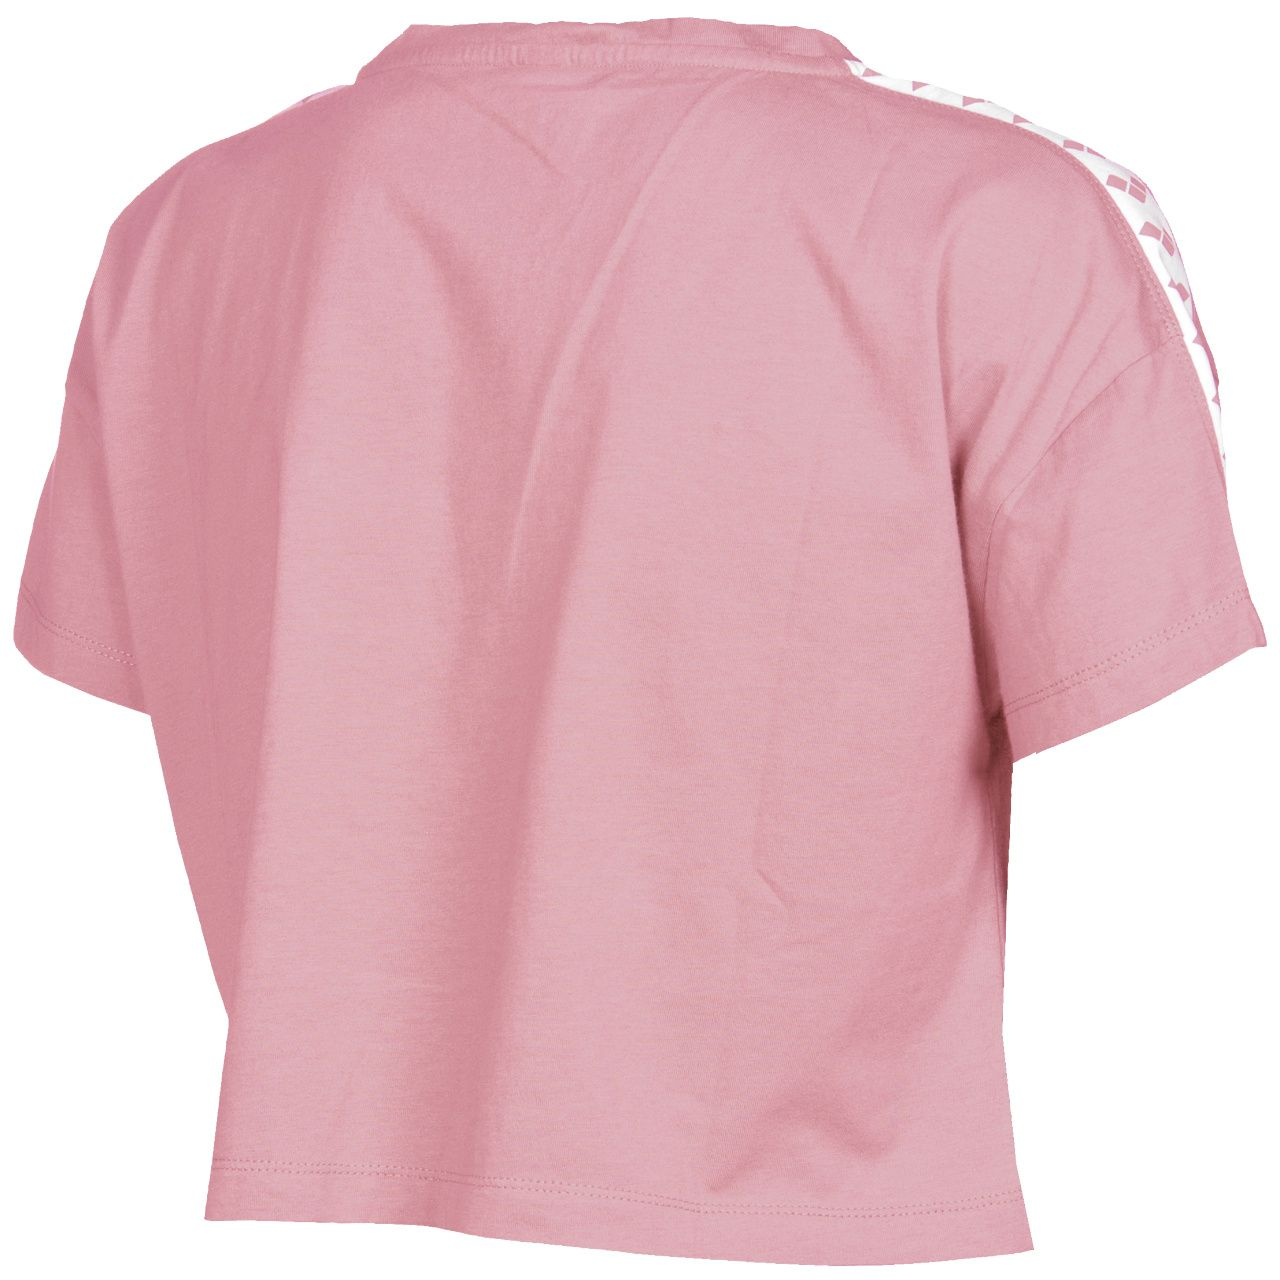 Camiseta Icons arena para Mujer Corinne Team_5906